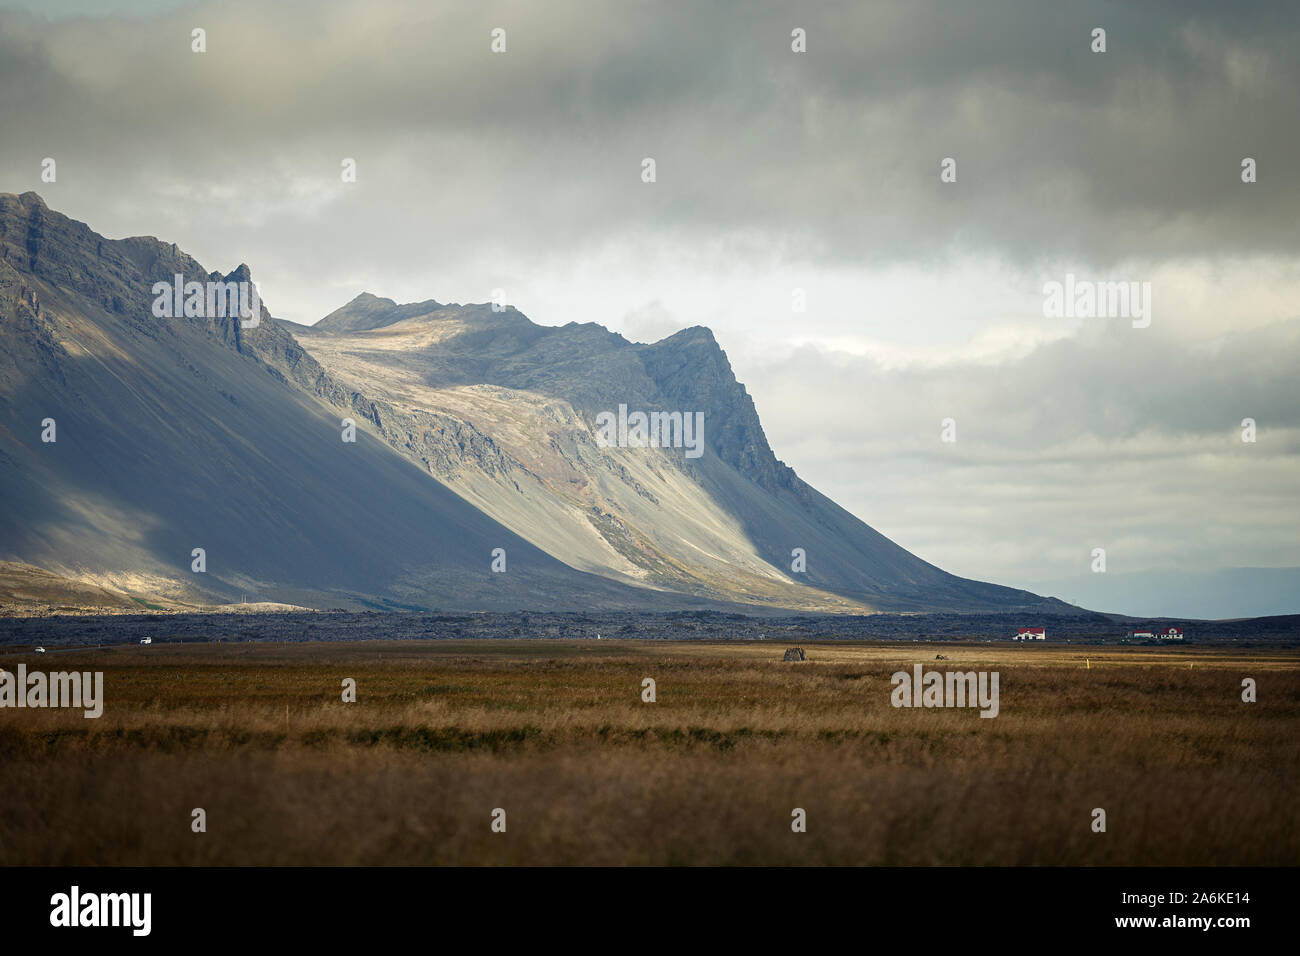 Hermoso paisaje de montaña en la península de Snaefellsnes, Islandia Foto de stock